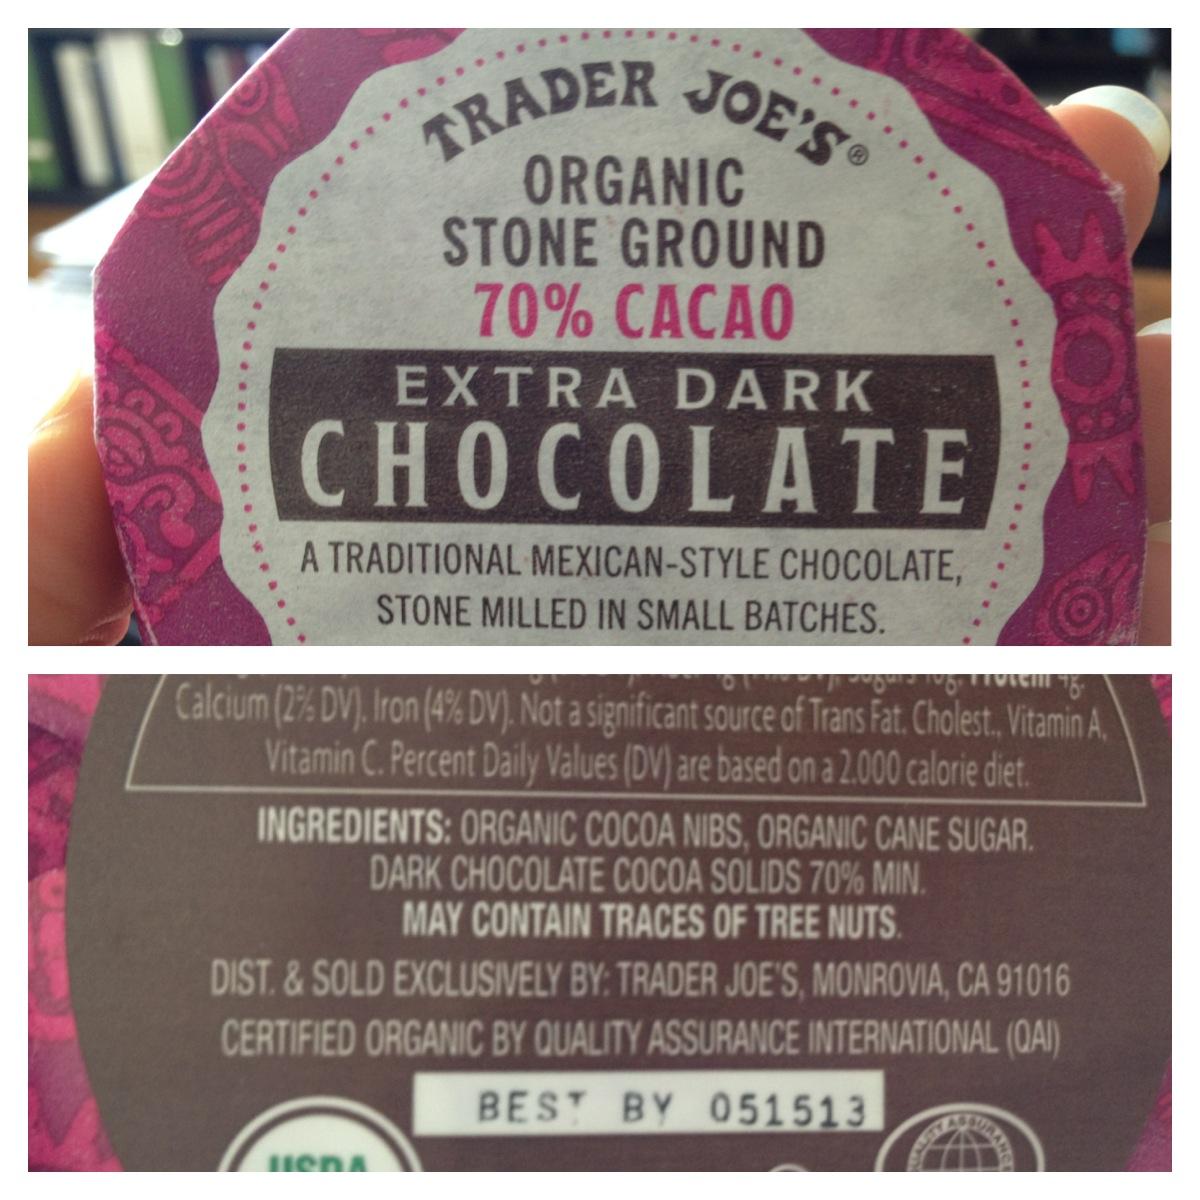 All Hail Dark Chocolate - 10 Surprising Health Benefits of Dark ...